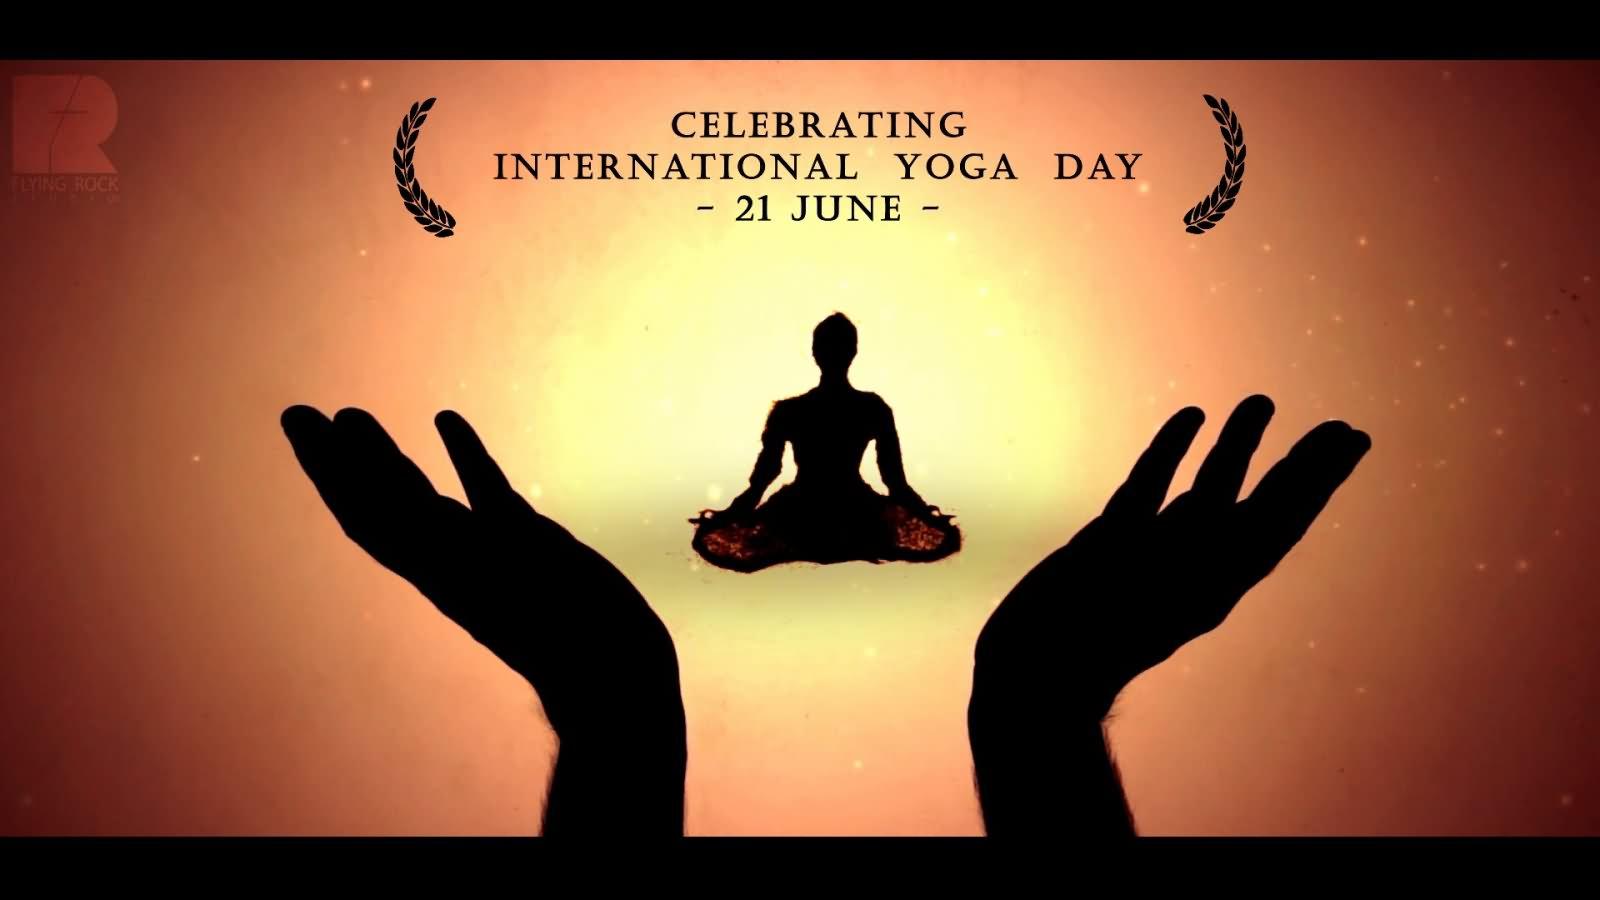 International Yoga Day 2019 Banner free download